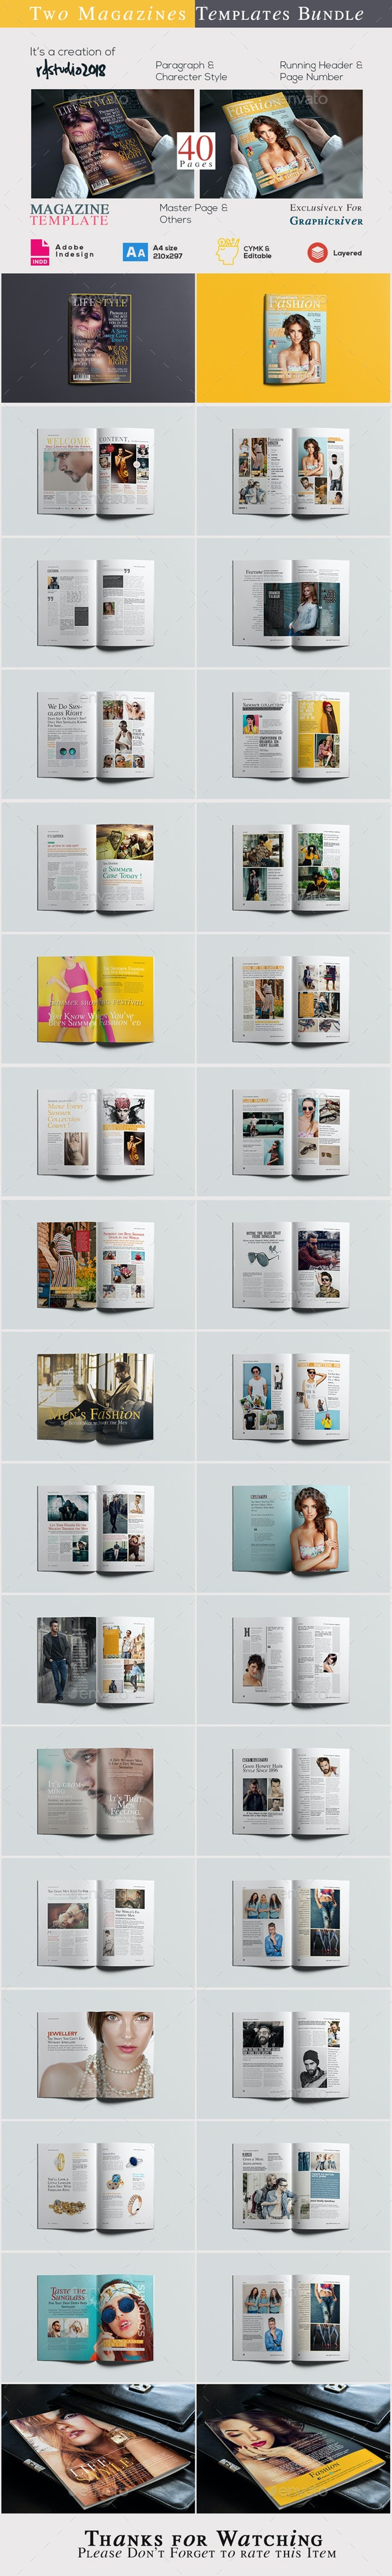 A4 Magazine Bundle Vol 01 - Magazines Print Templates